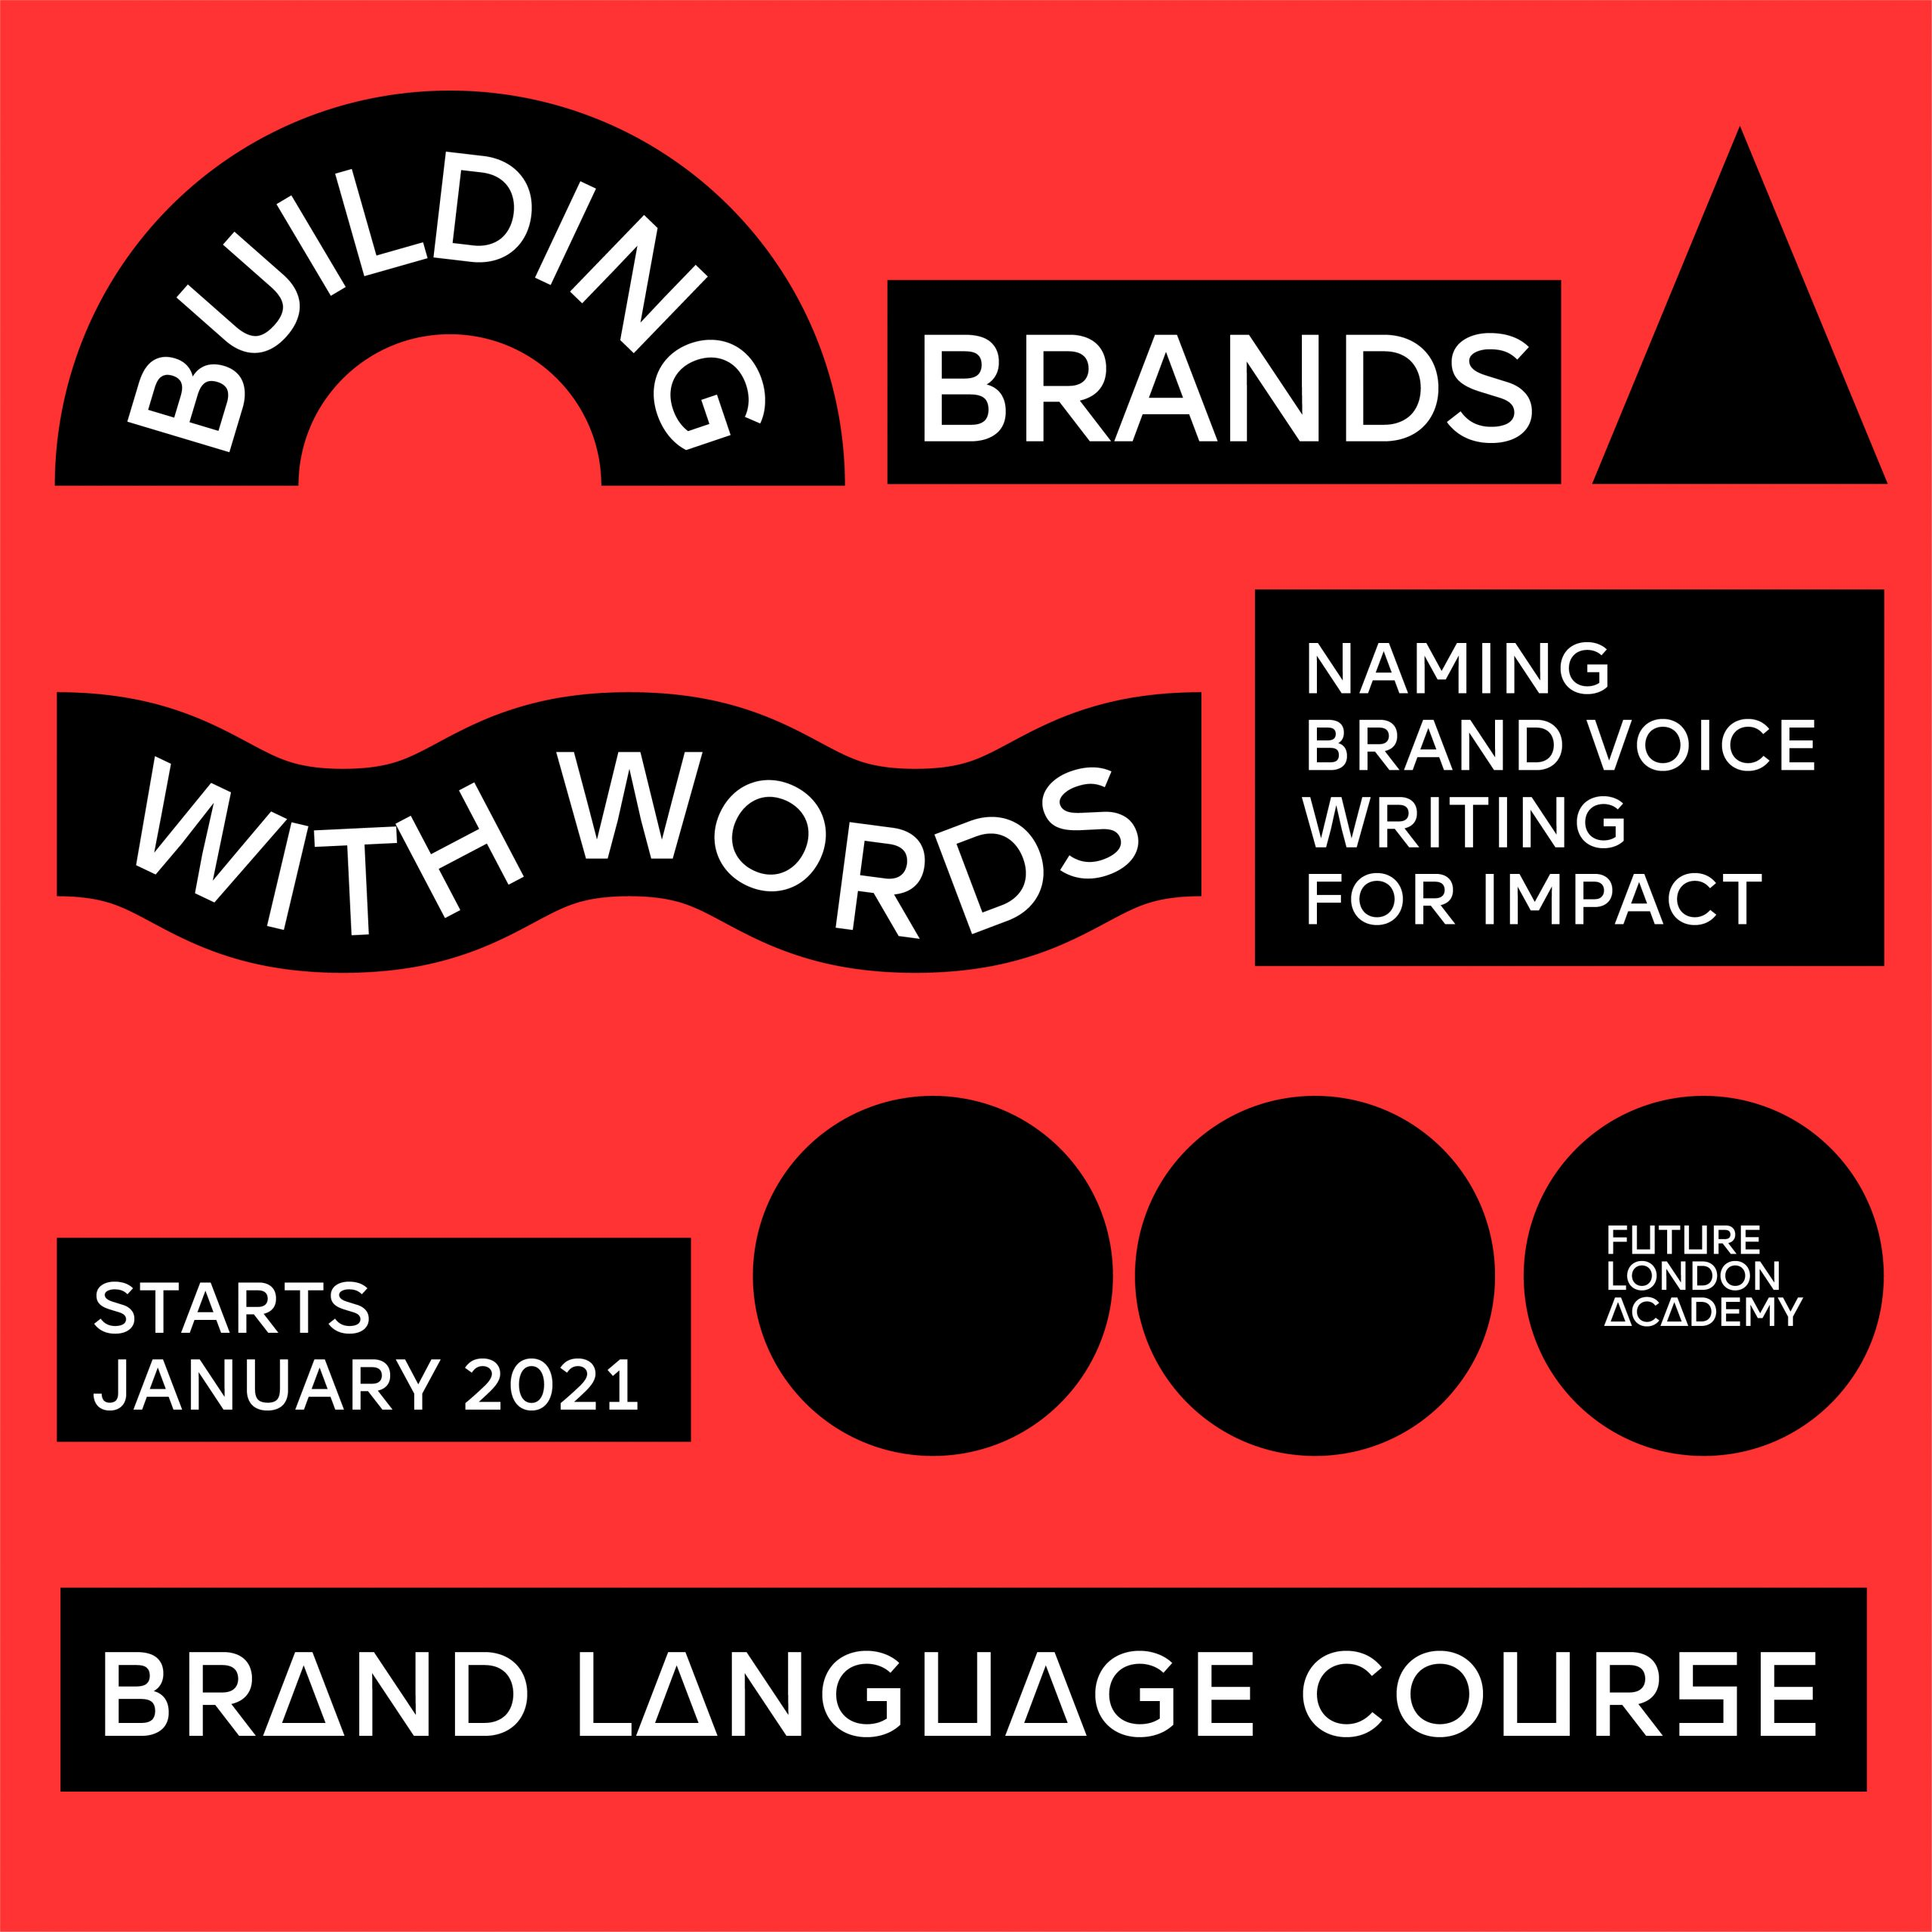 Brand_language_course-11.jpg